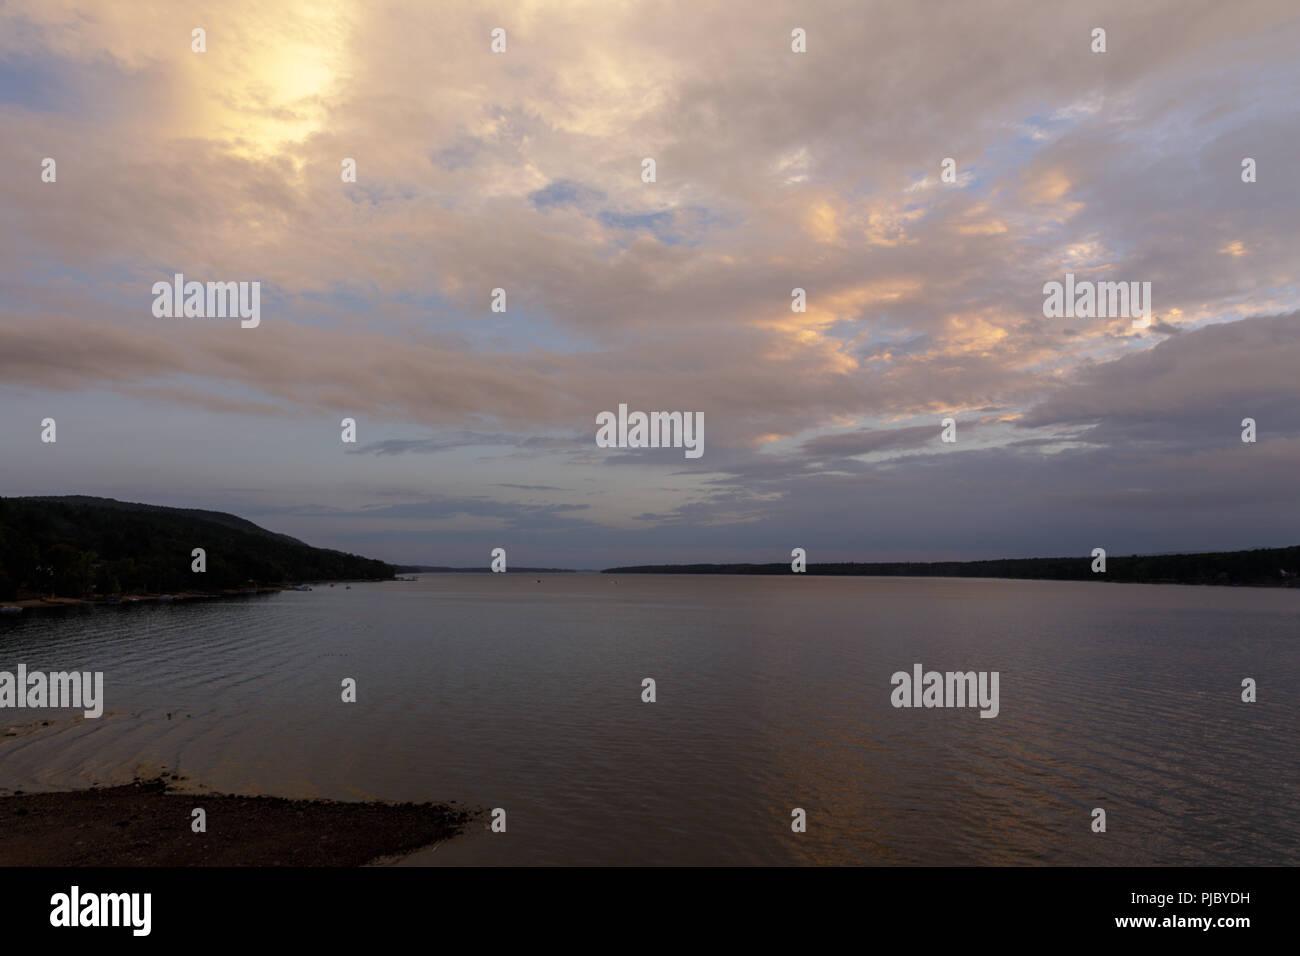 Sunset, Great Sacandaga Lake, in the southern Adirondacks, New York State. - Stock Image